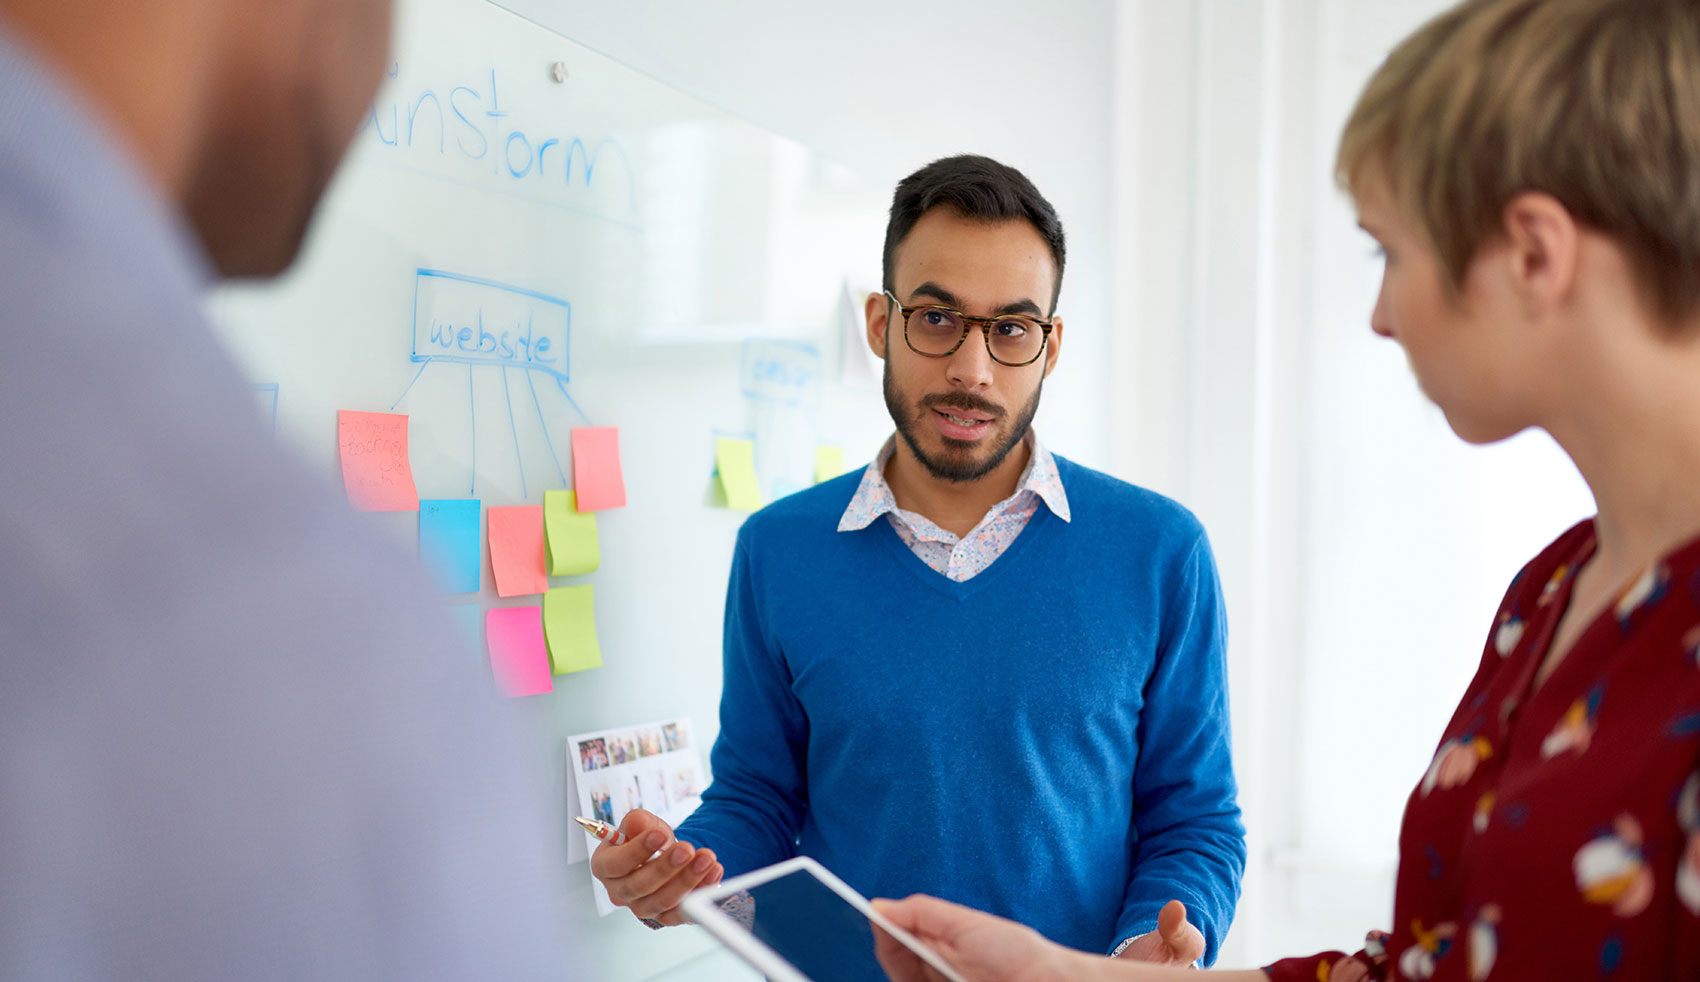 B2B & B2C Guide to Developing a Social Media Plan